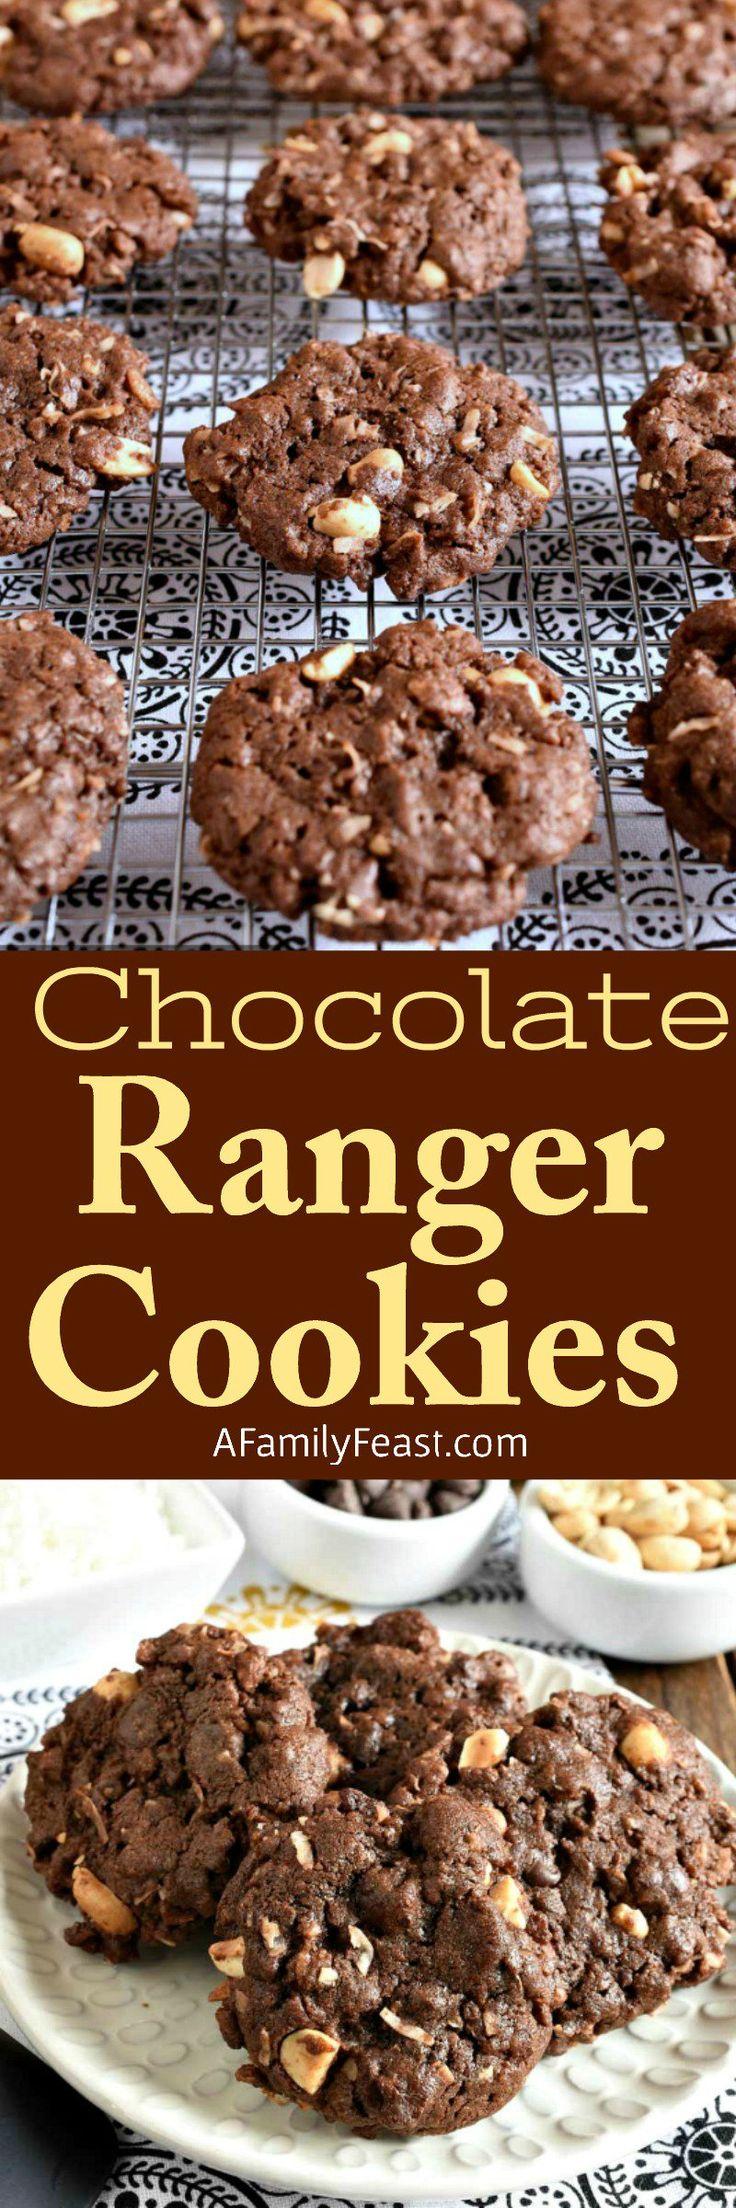 Chocolate Ranger Cookies